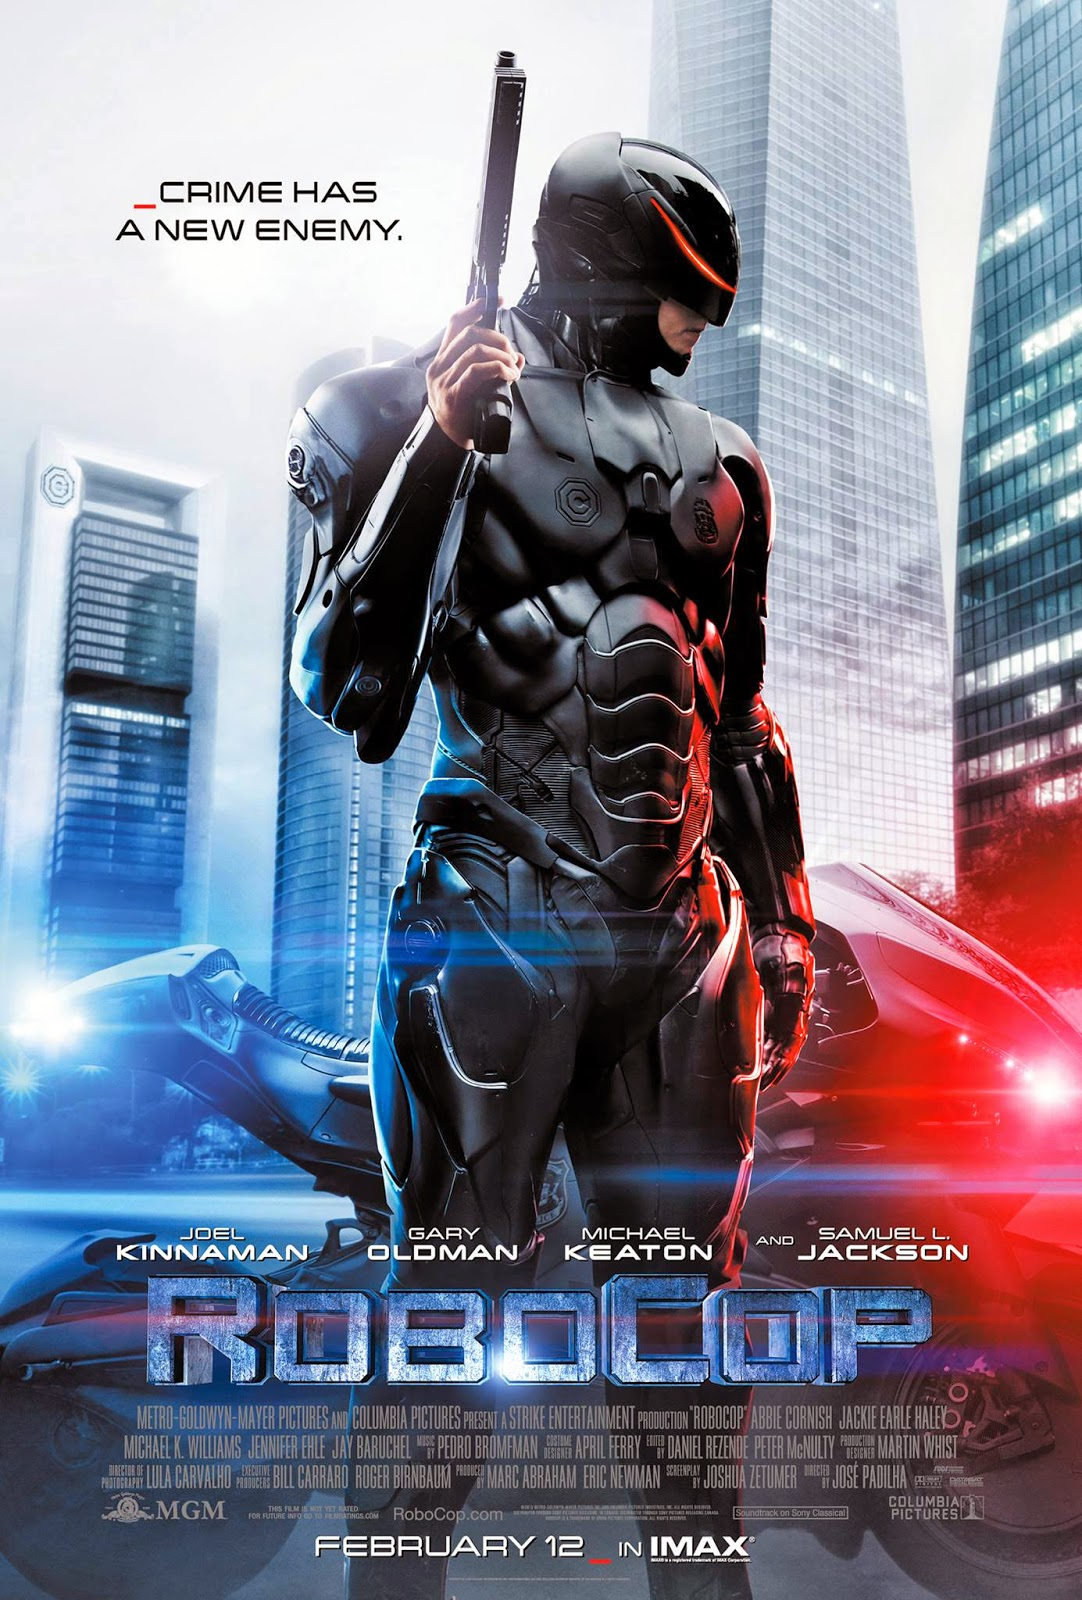 Cảnh Sát Người Máy - Robocop (2014) Poster